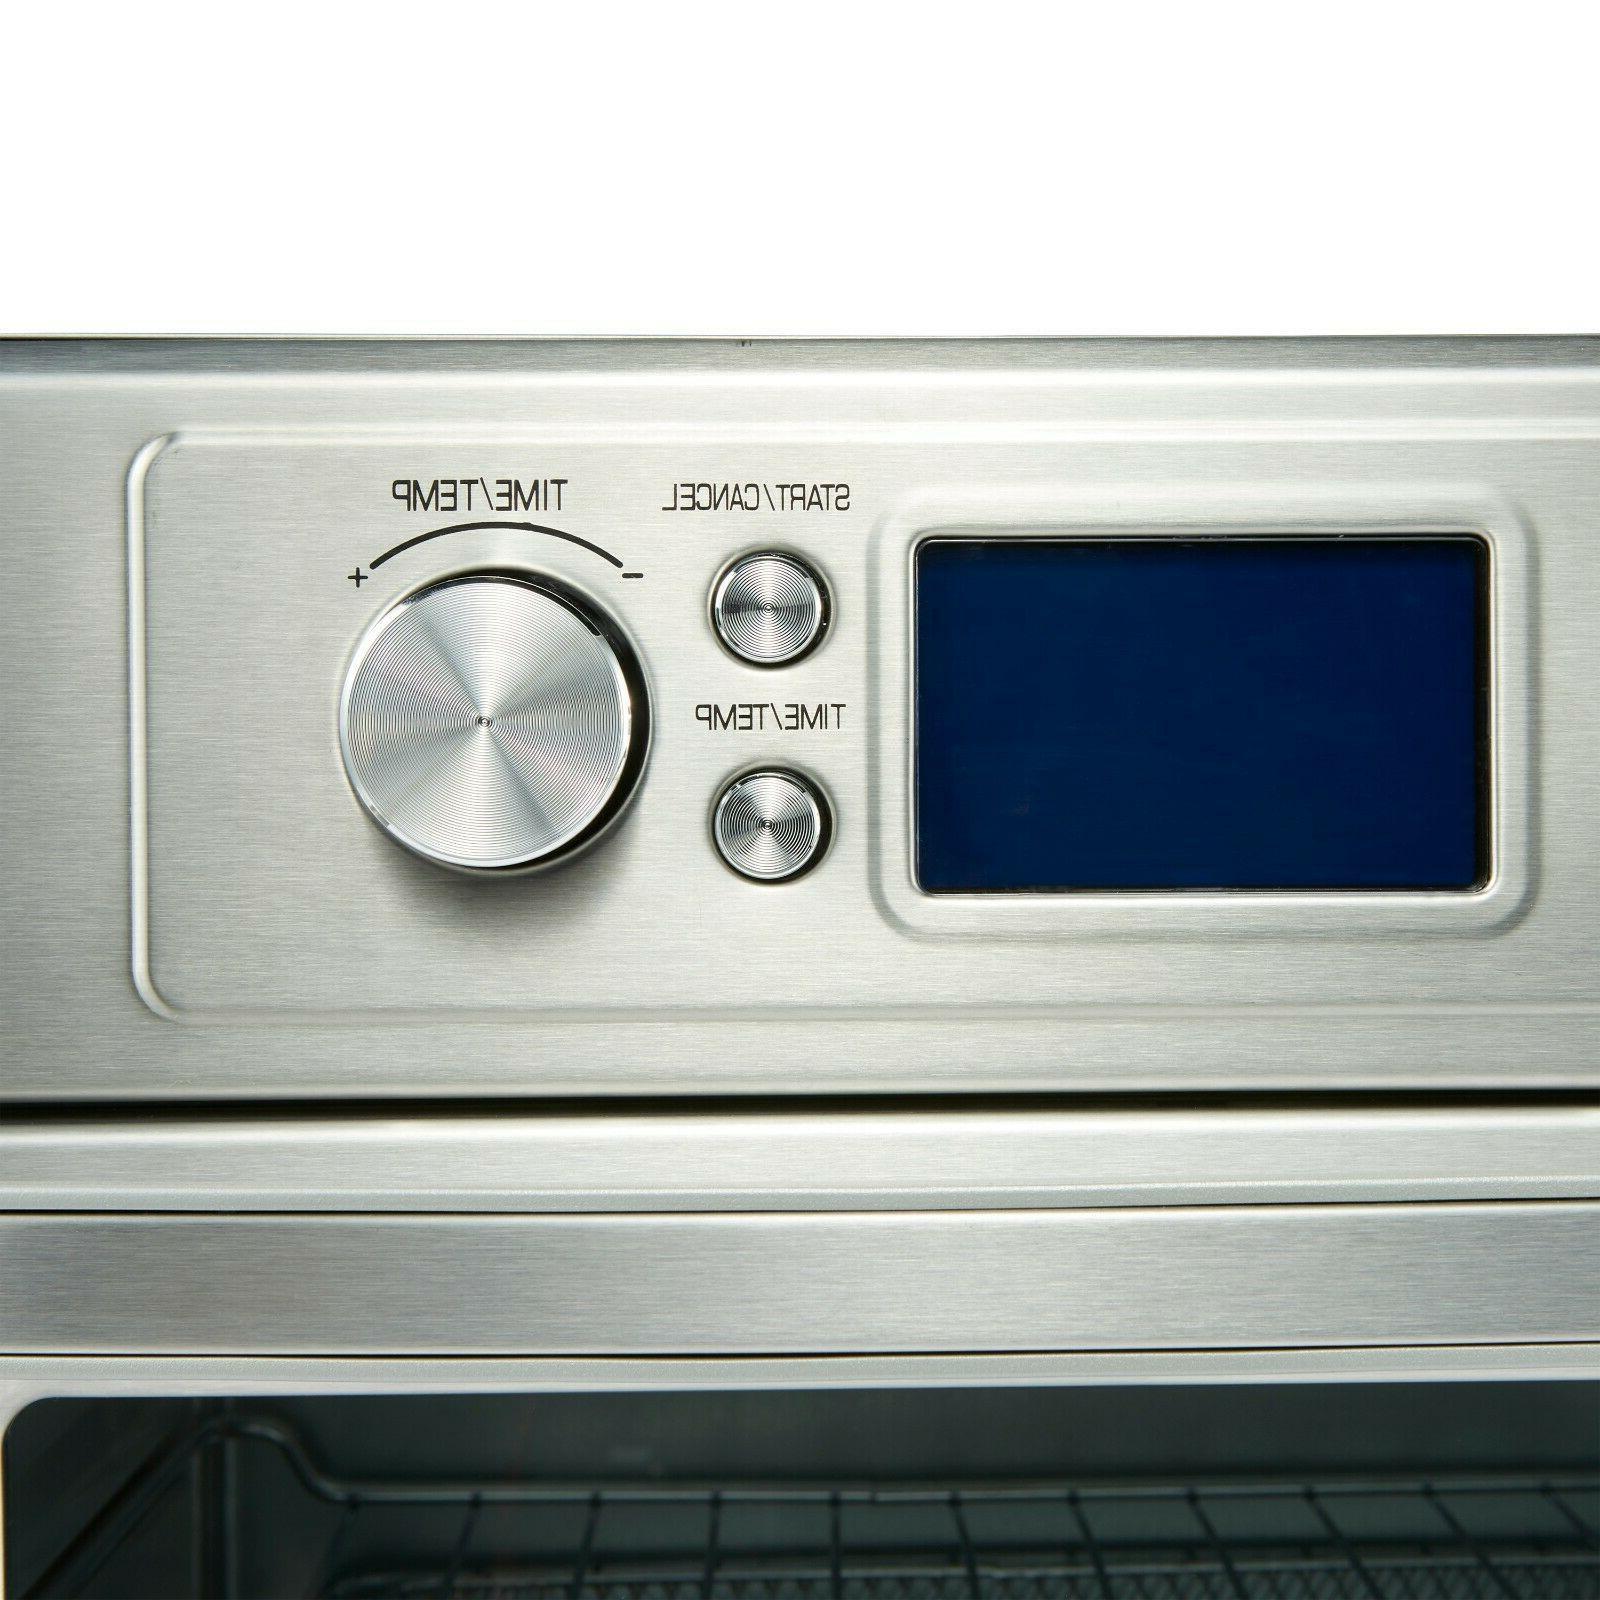 Convection Oven Fryer Fast Auto Shutoff Sound NEW